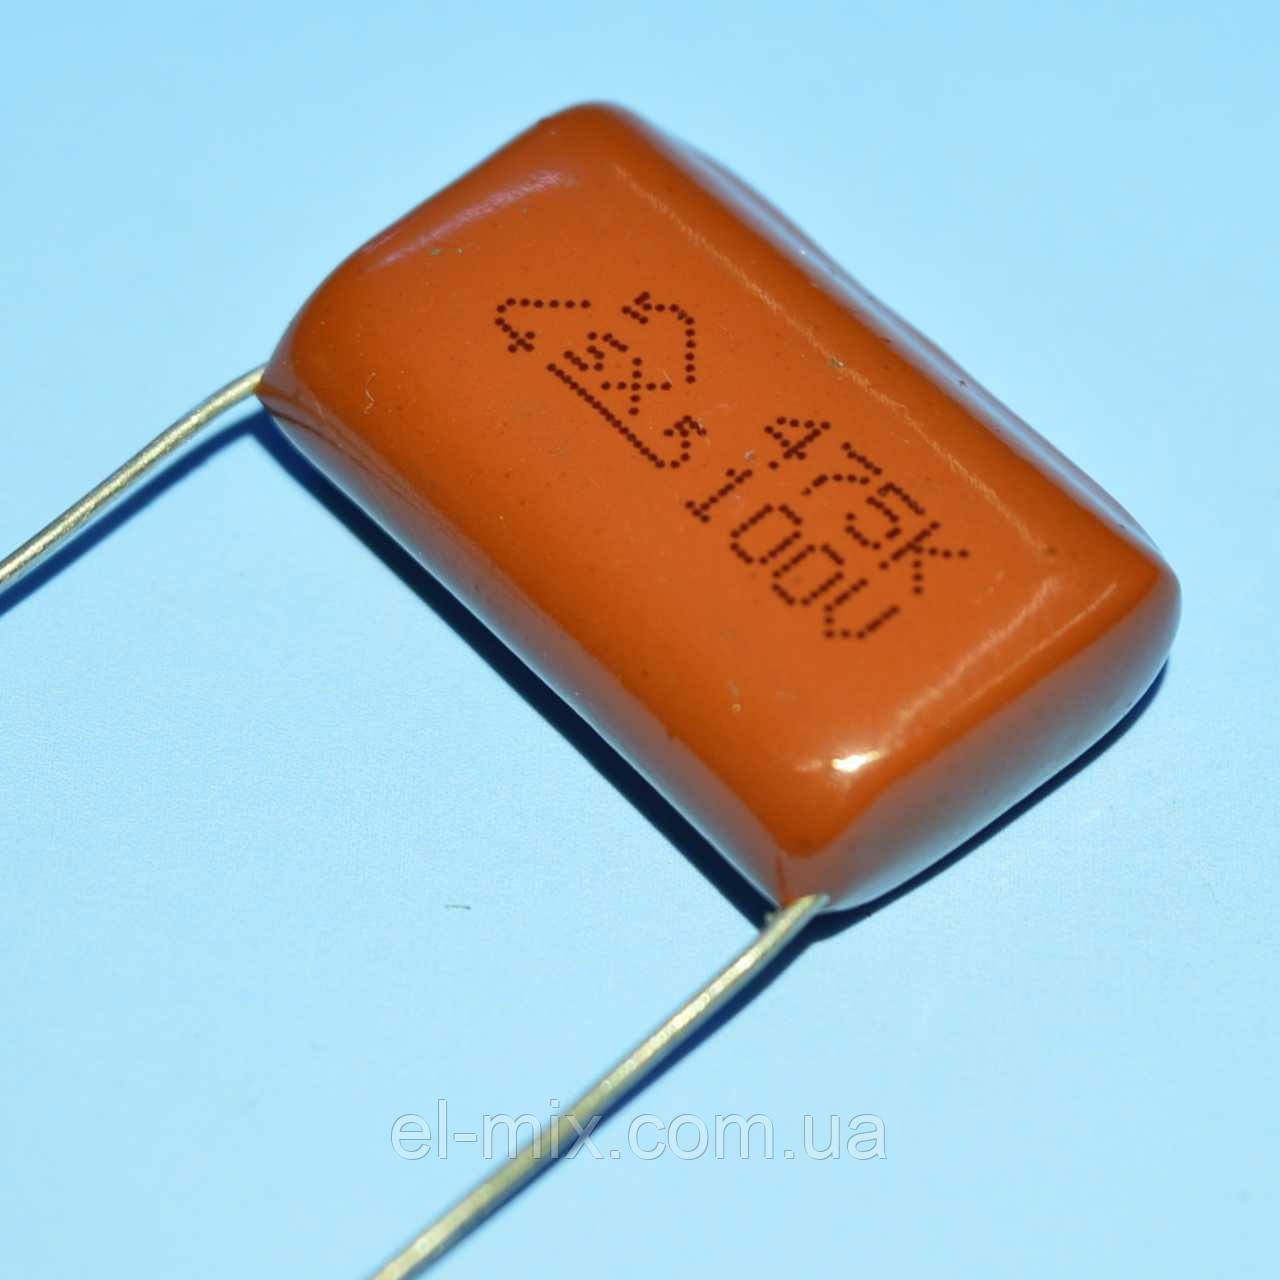 Конденсатор металлопленочный CL-21 4.7 µF 100V ±10% SX